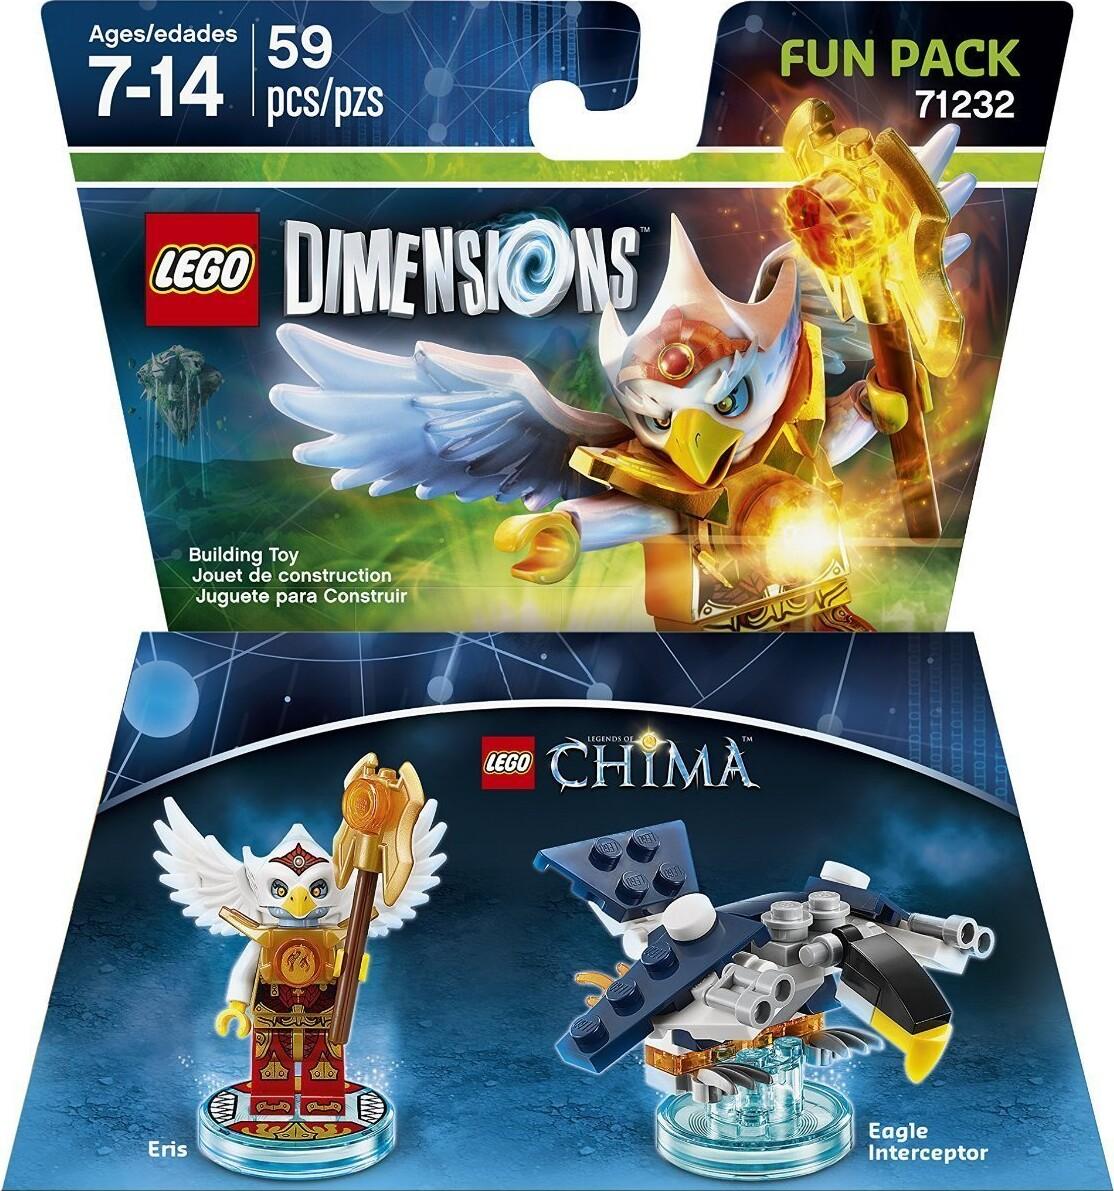 Lego 71232, chima lego dimensions, eris lego dimensions, lego dimensioner, eris fun pack, lego dimensions fun packs